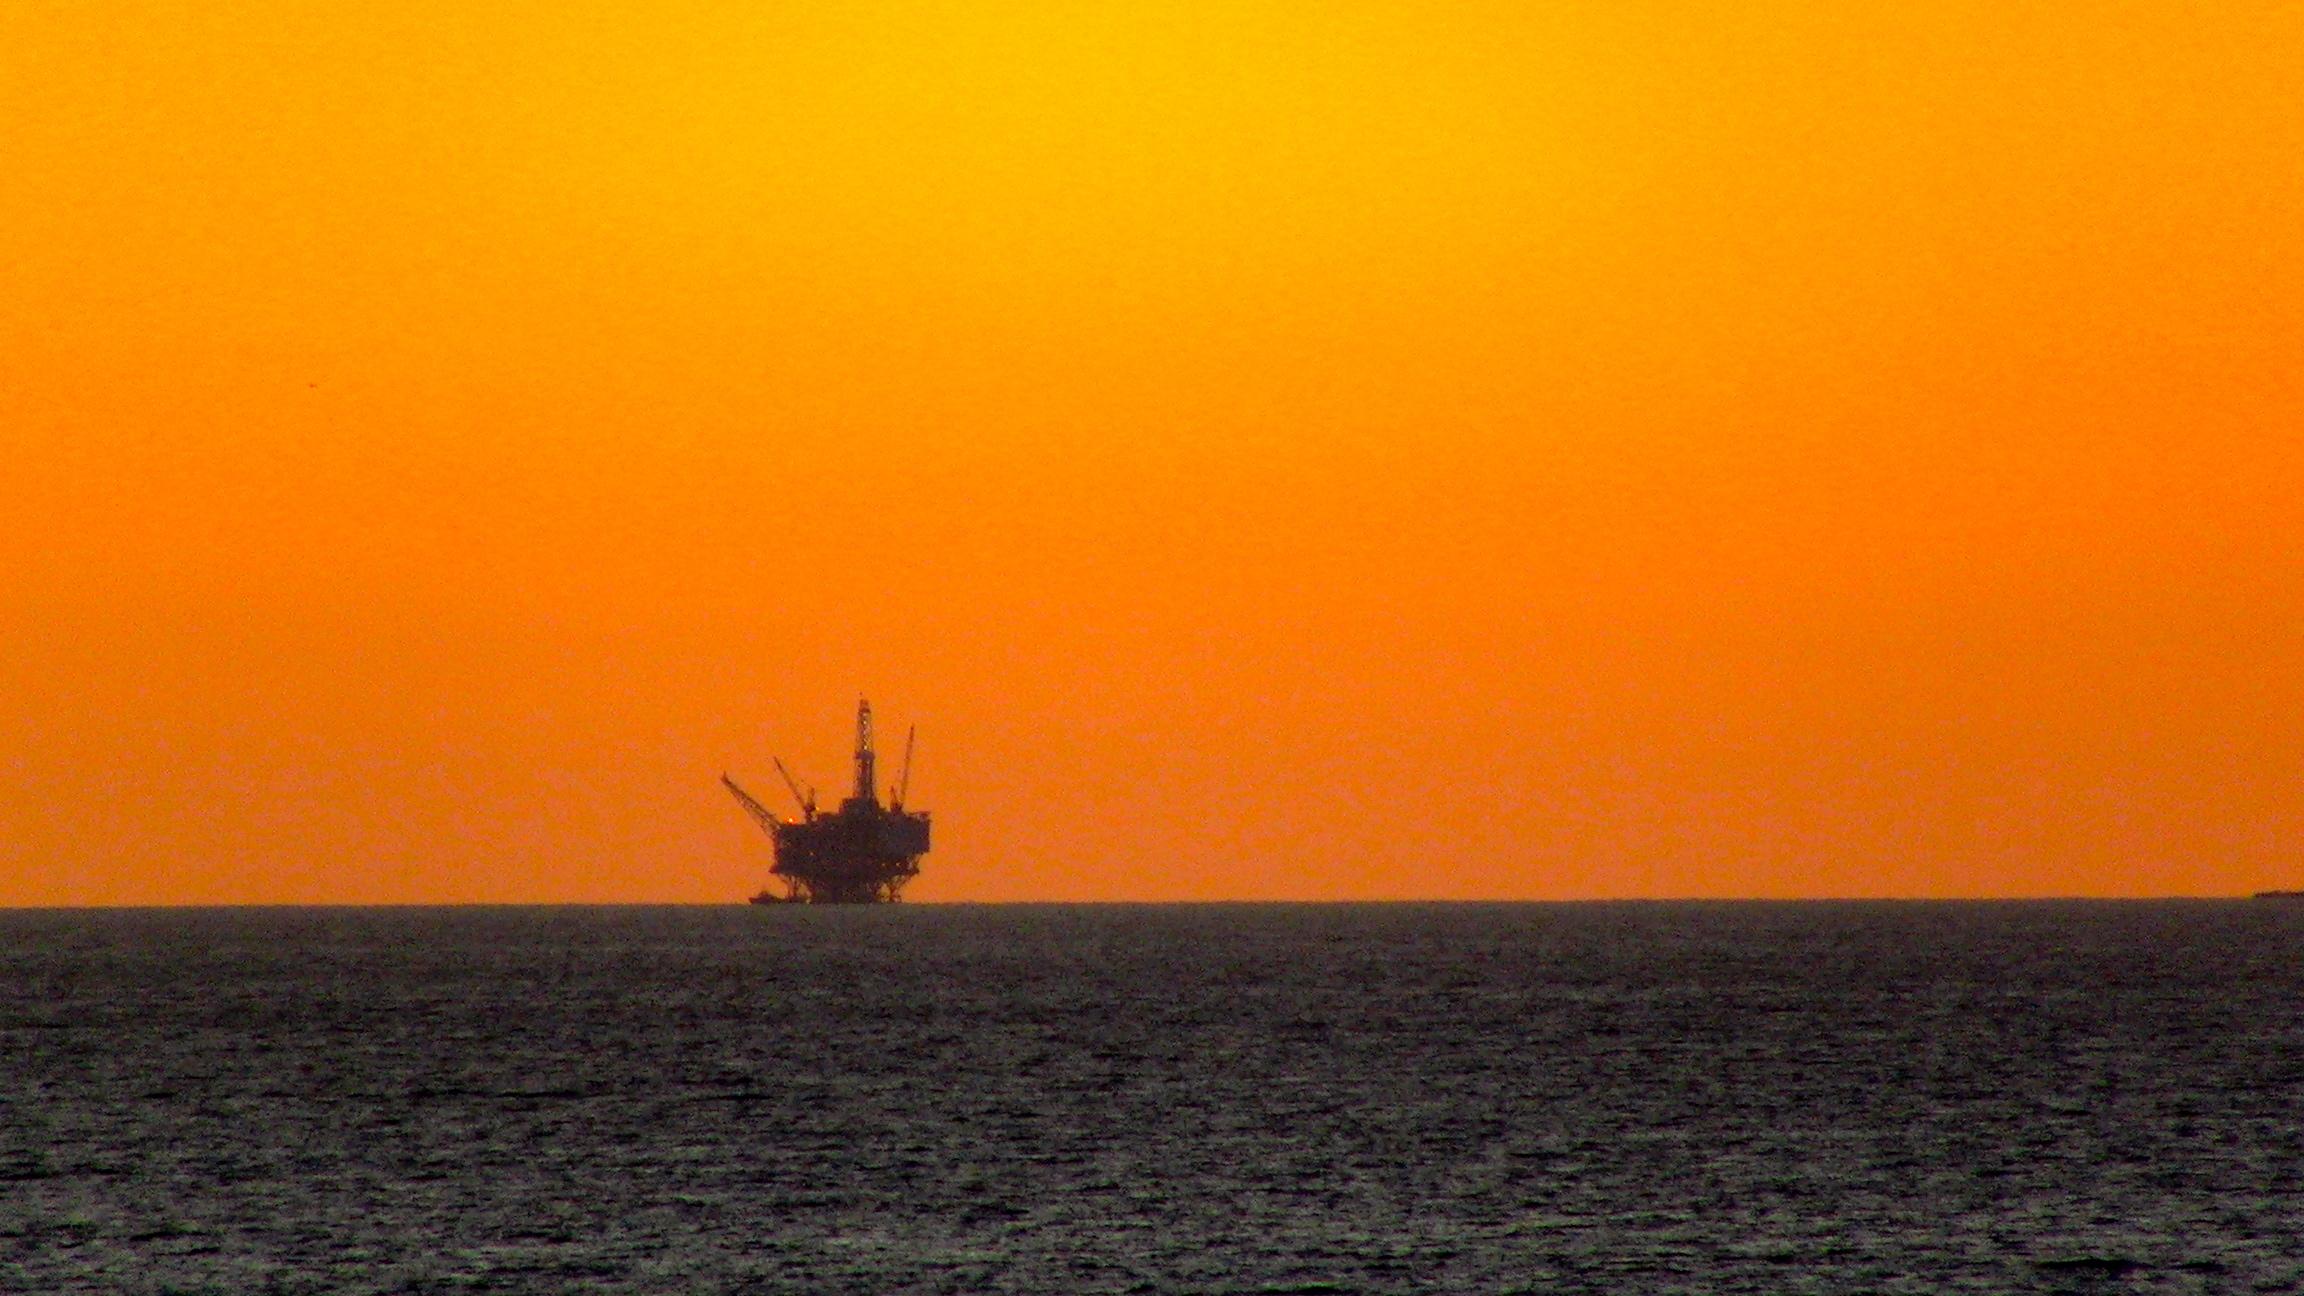 Oil platform Wikiwand